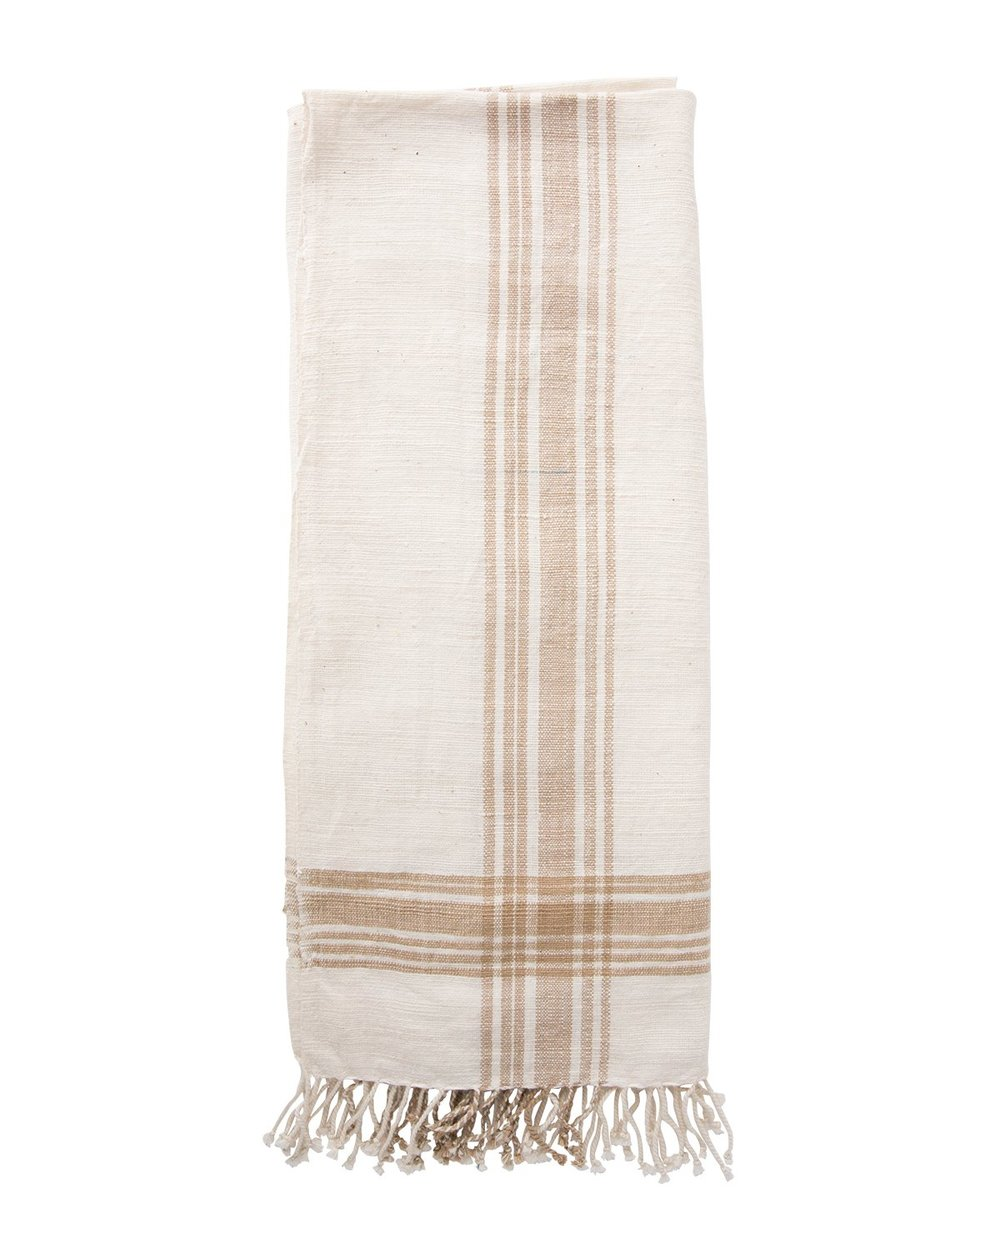 Hand_Towels_3.jpg